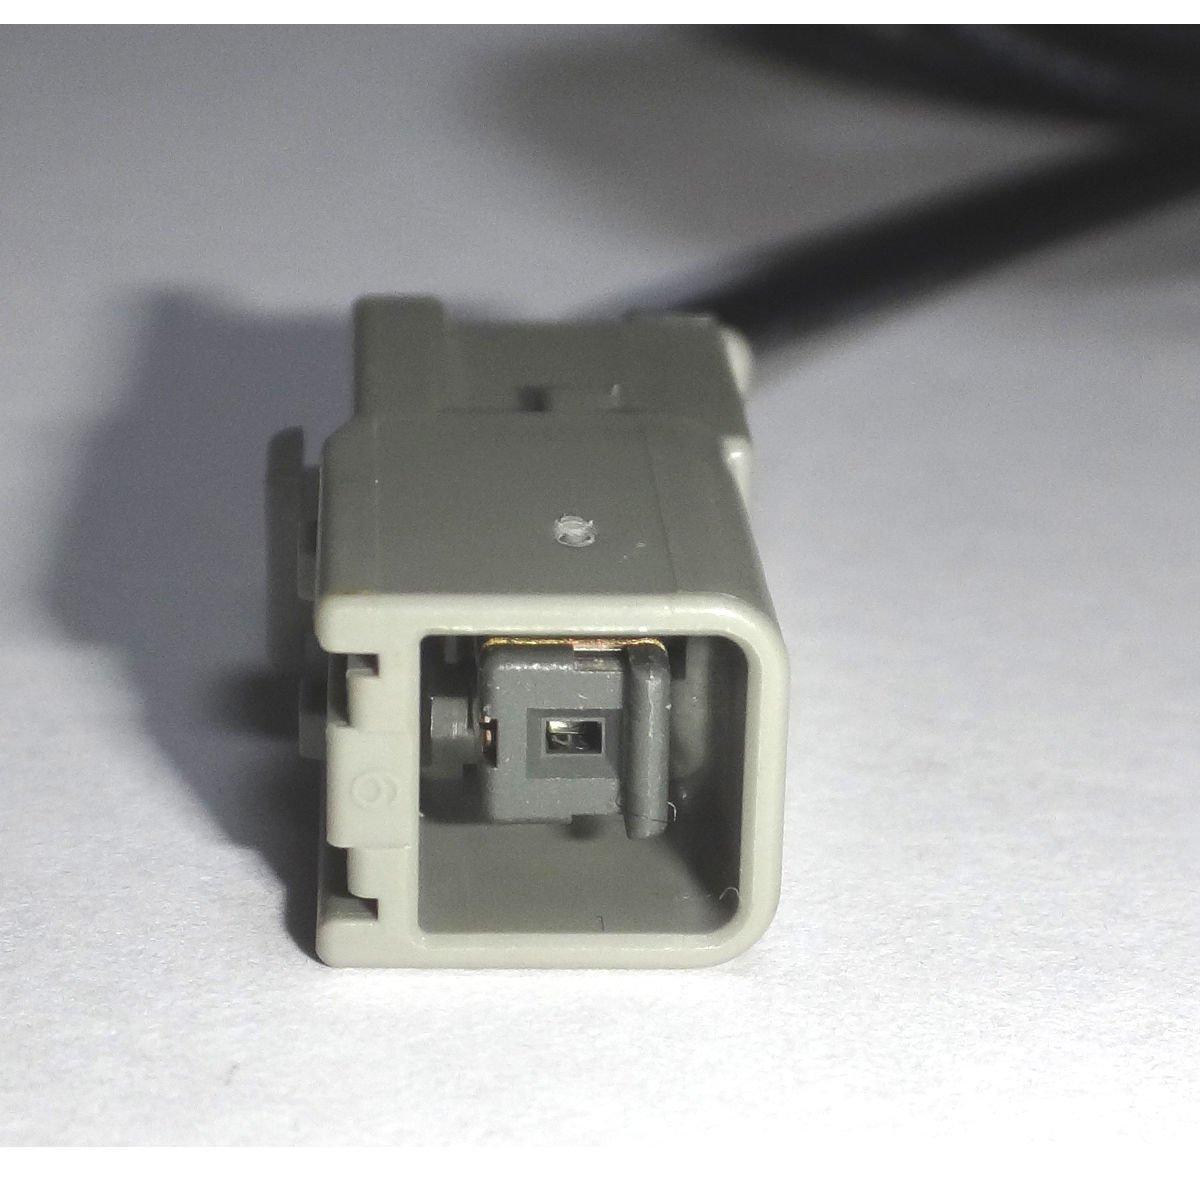 Z928E S920E INE S900R W928R Antena Gps externa Yihaoel para Alpine INE cadino W920R cadino